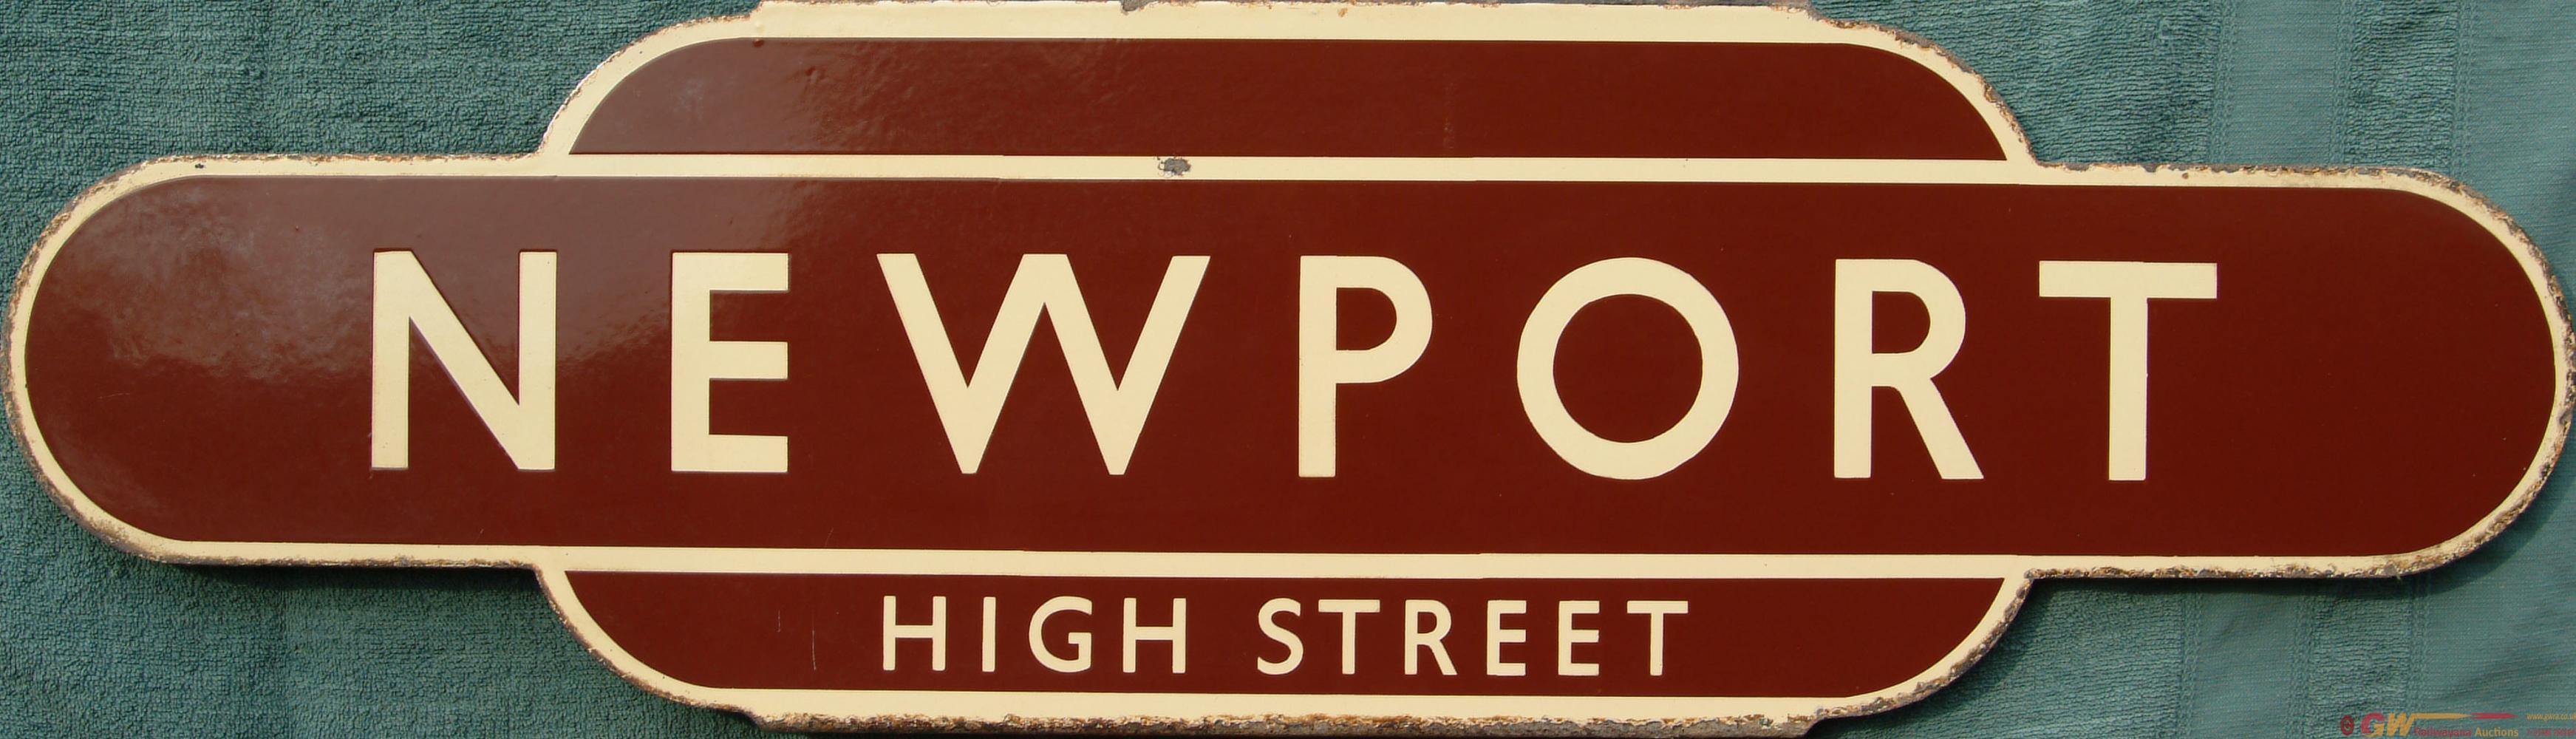 Totem, BR(W) NEWPORT HIGH STREET, H/F. Ex GWR